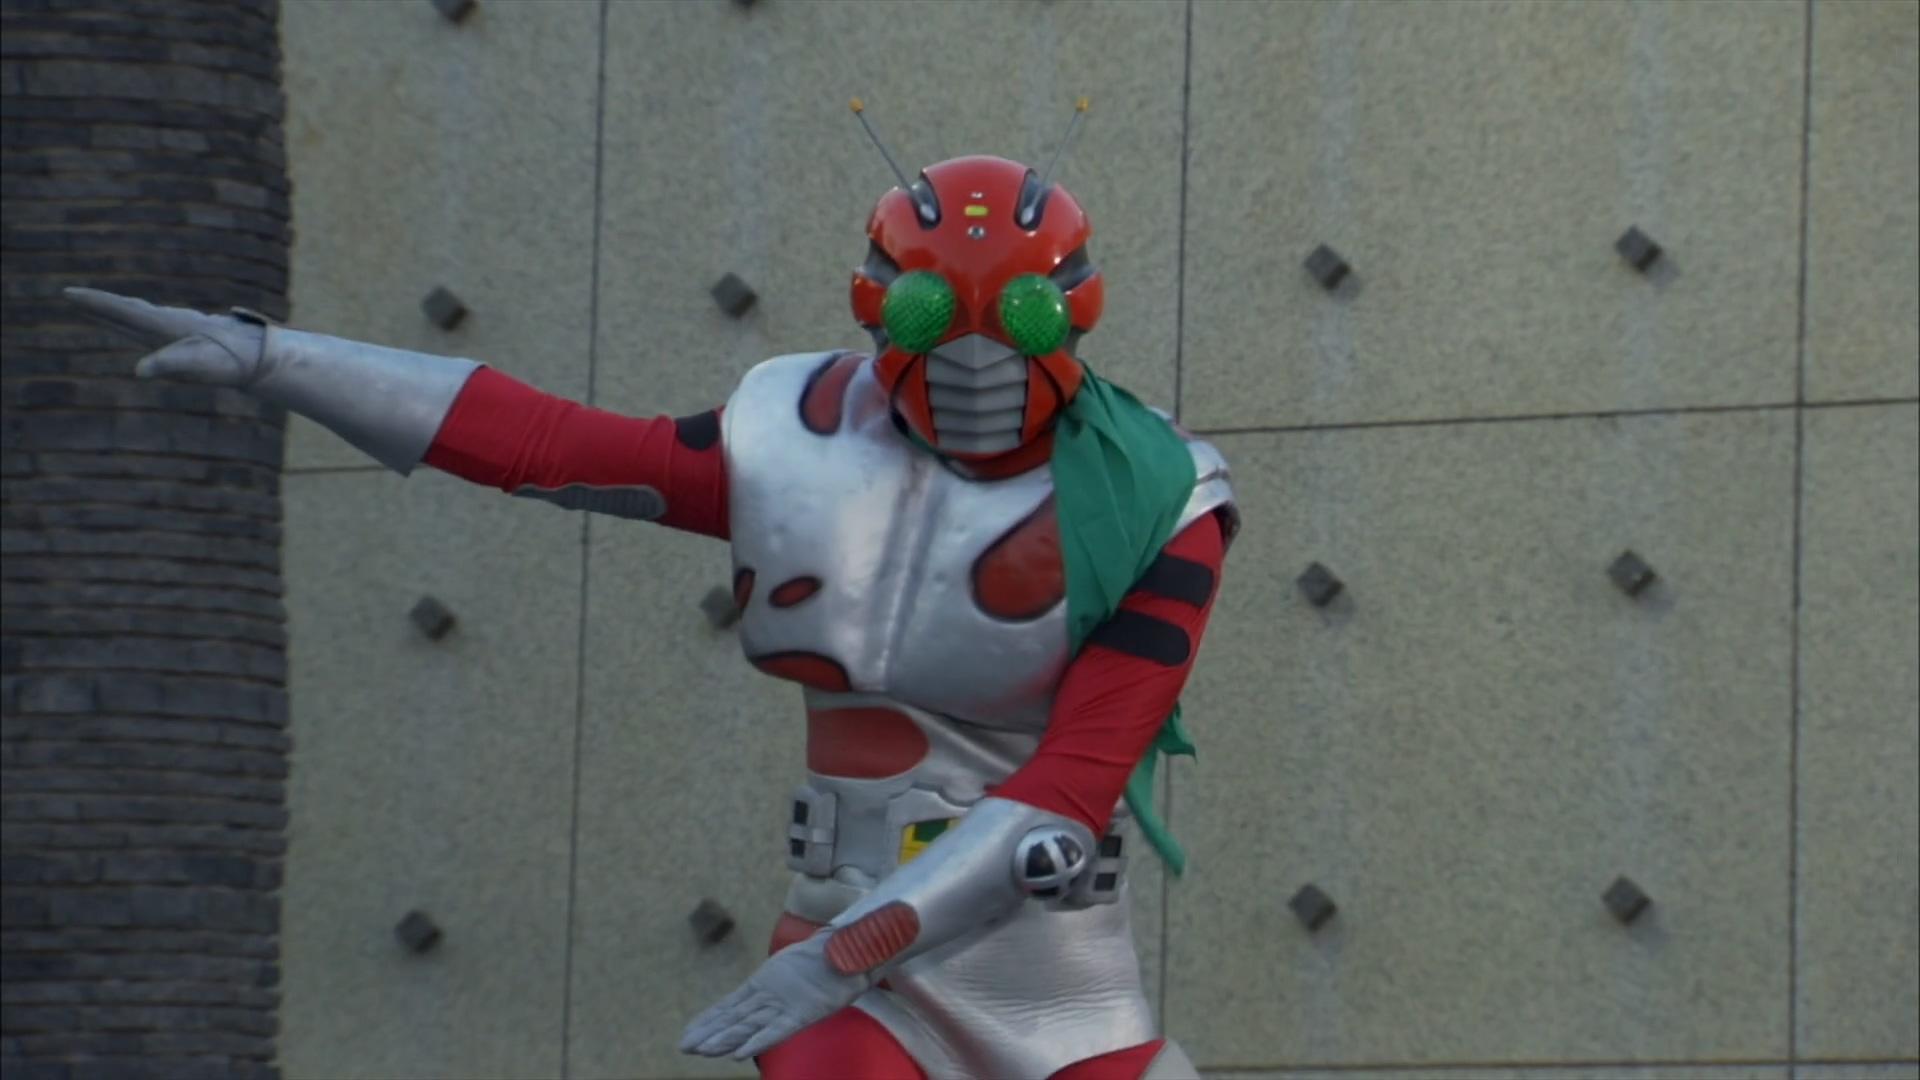 http://vignette3.wikia.nocookie.net/kamenrider/images/8/8e/ZX_(Let's_Go_Kamen_Riders).jpg/revision/latest?cb=20120613170928